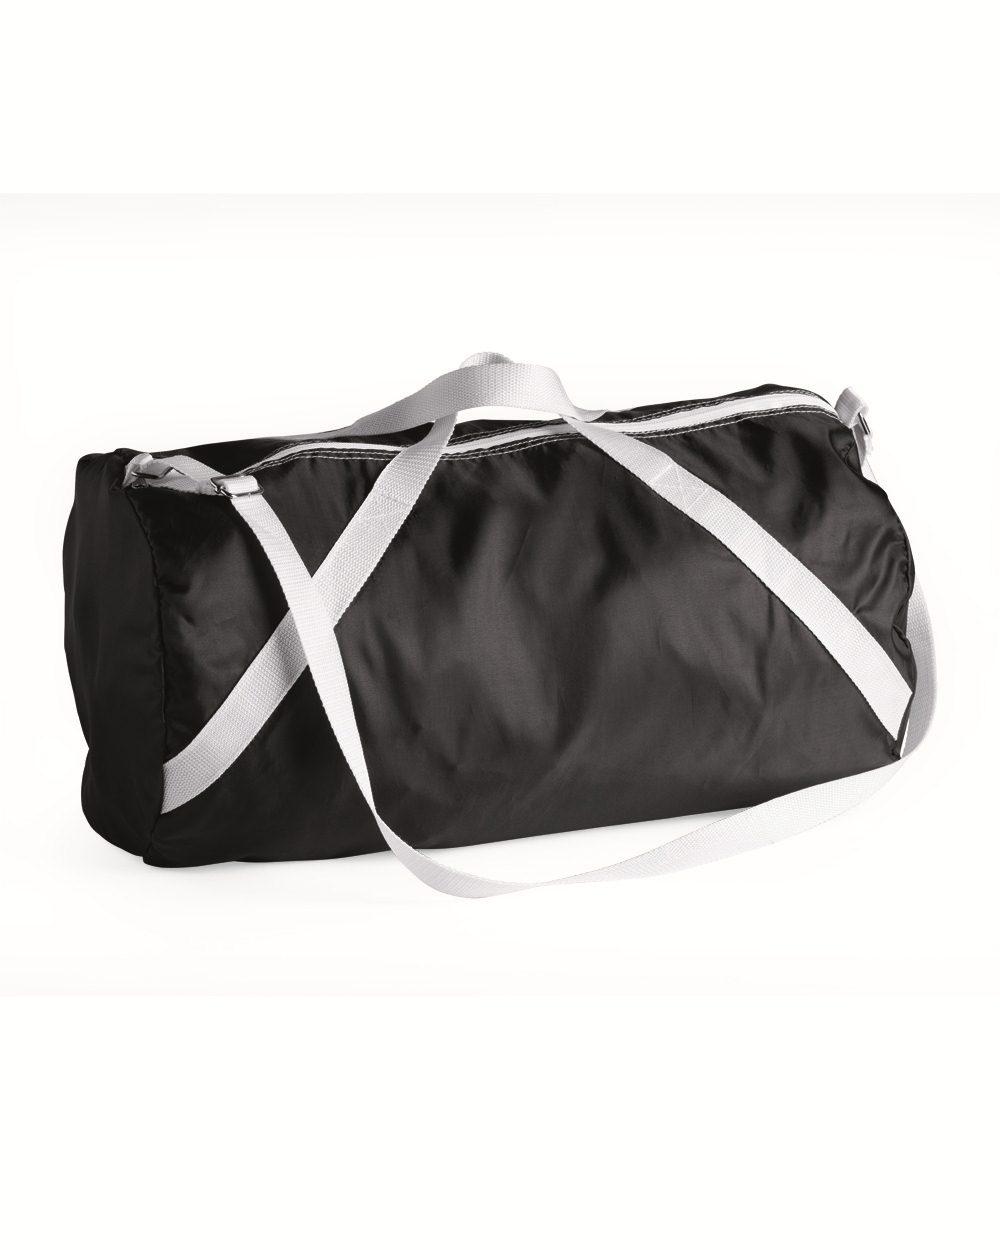 Liberty Bags Nylon Roll Bag - FT004